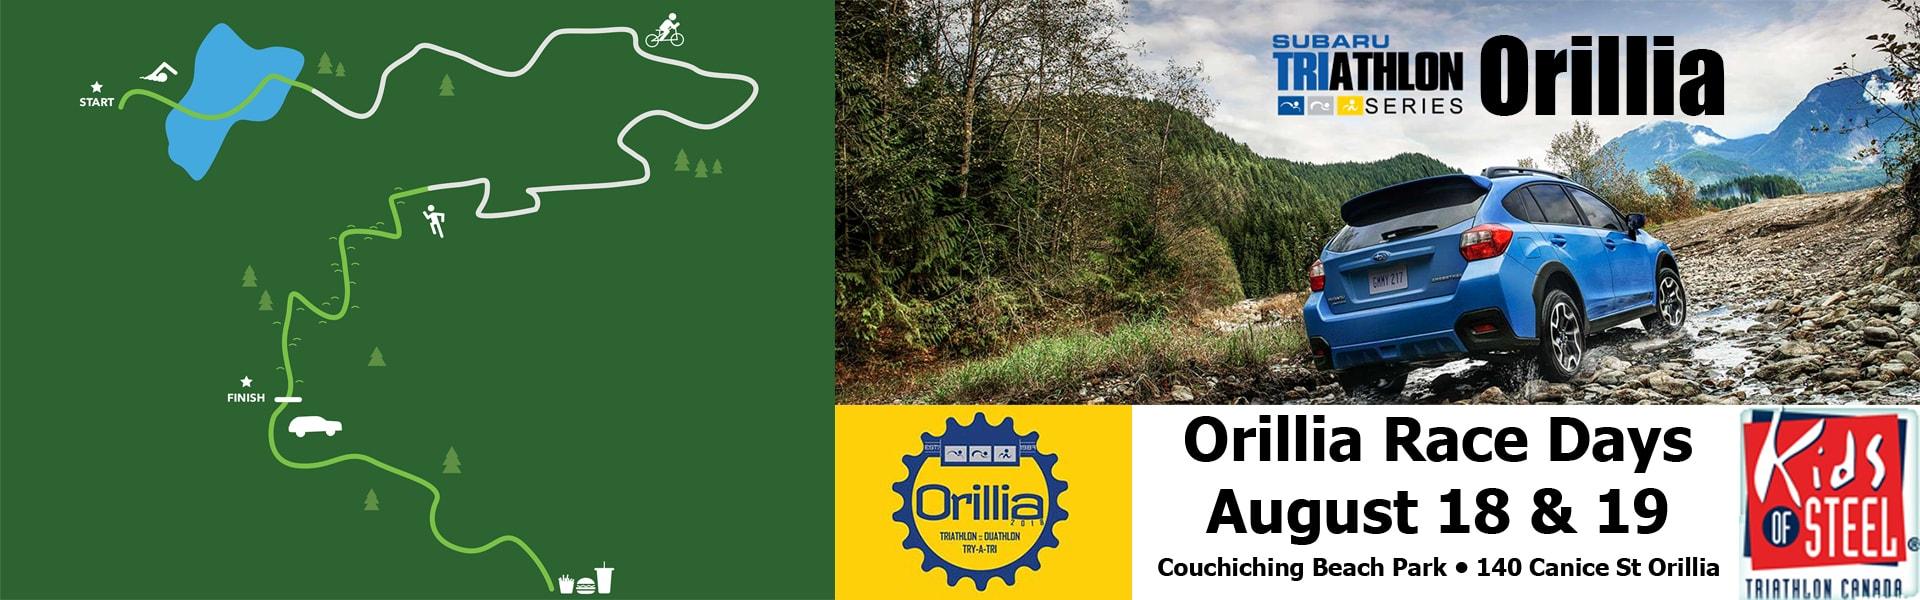 Subaru Triathlon Series Orillia